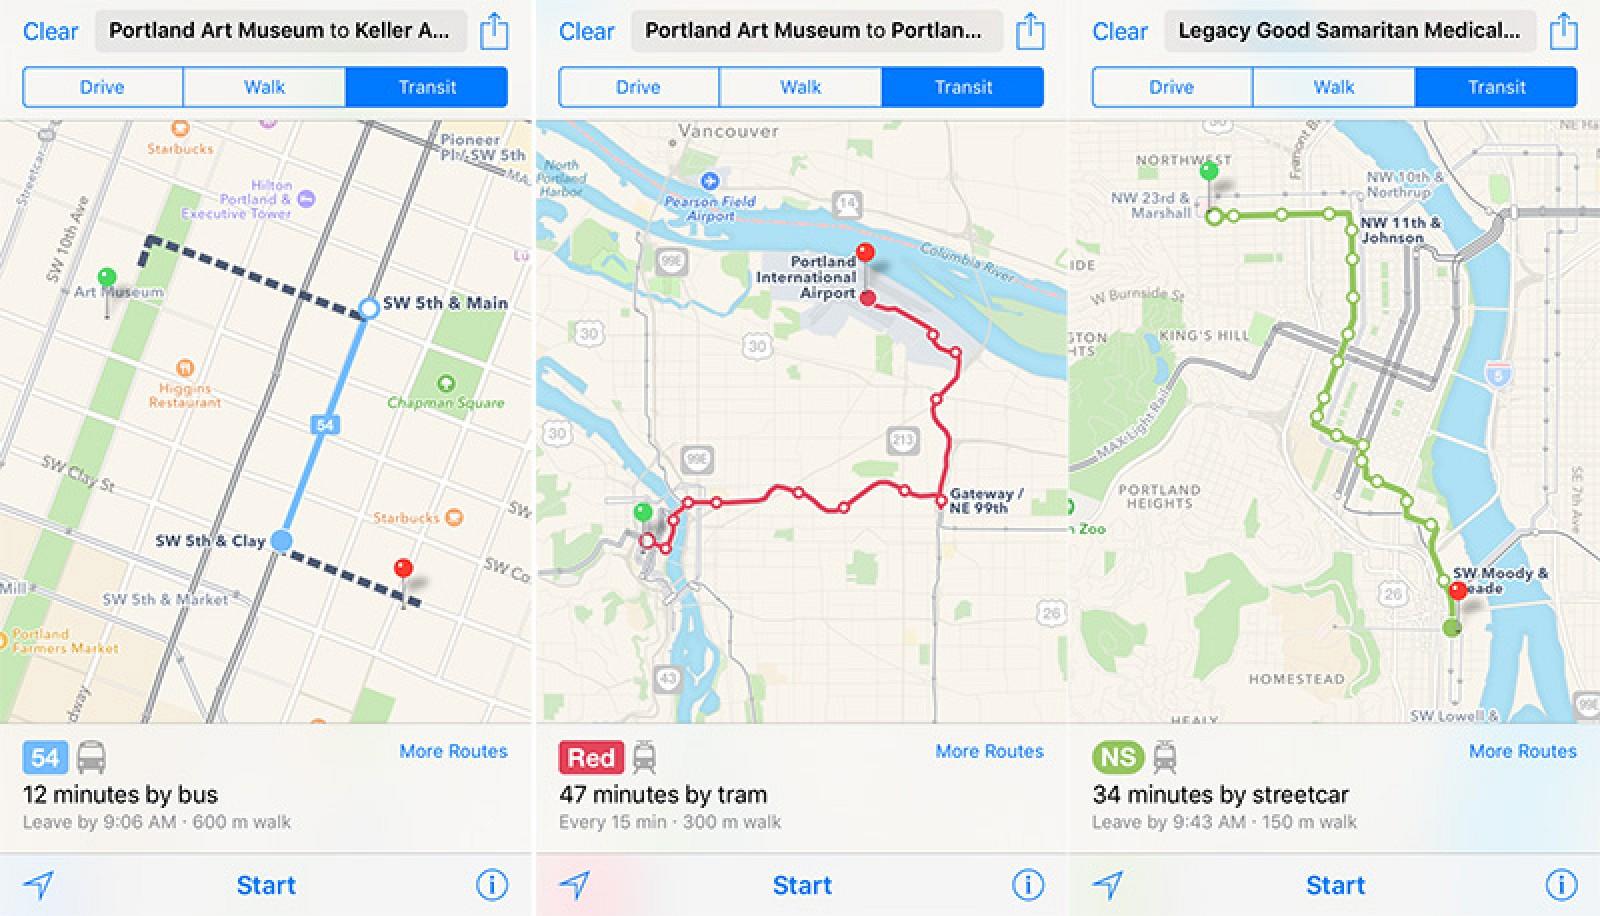 Apple Maps Expands Transit Data to Portland, Oregon - MacRumors